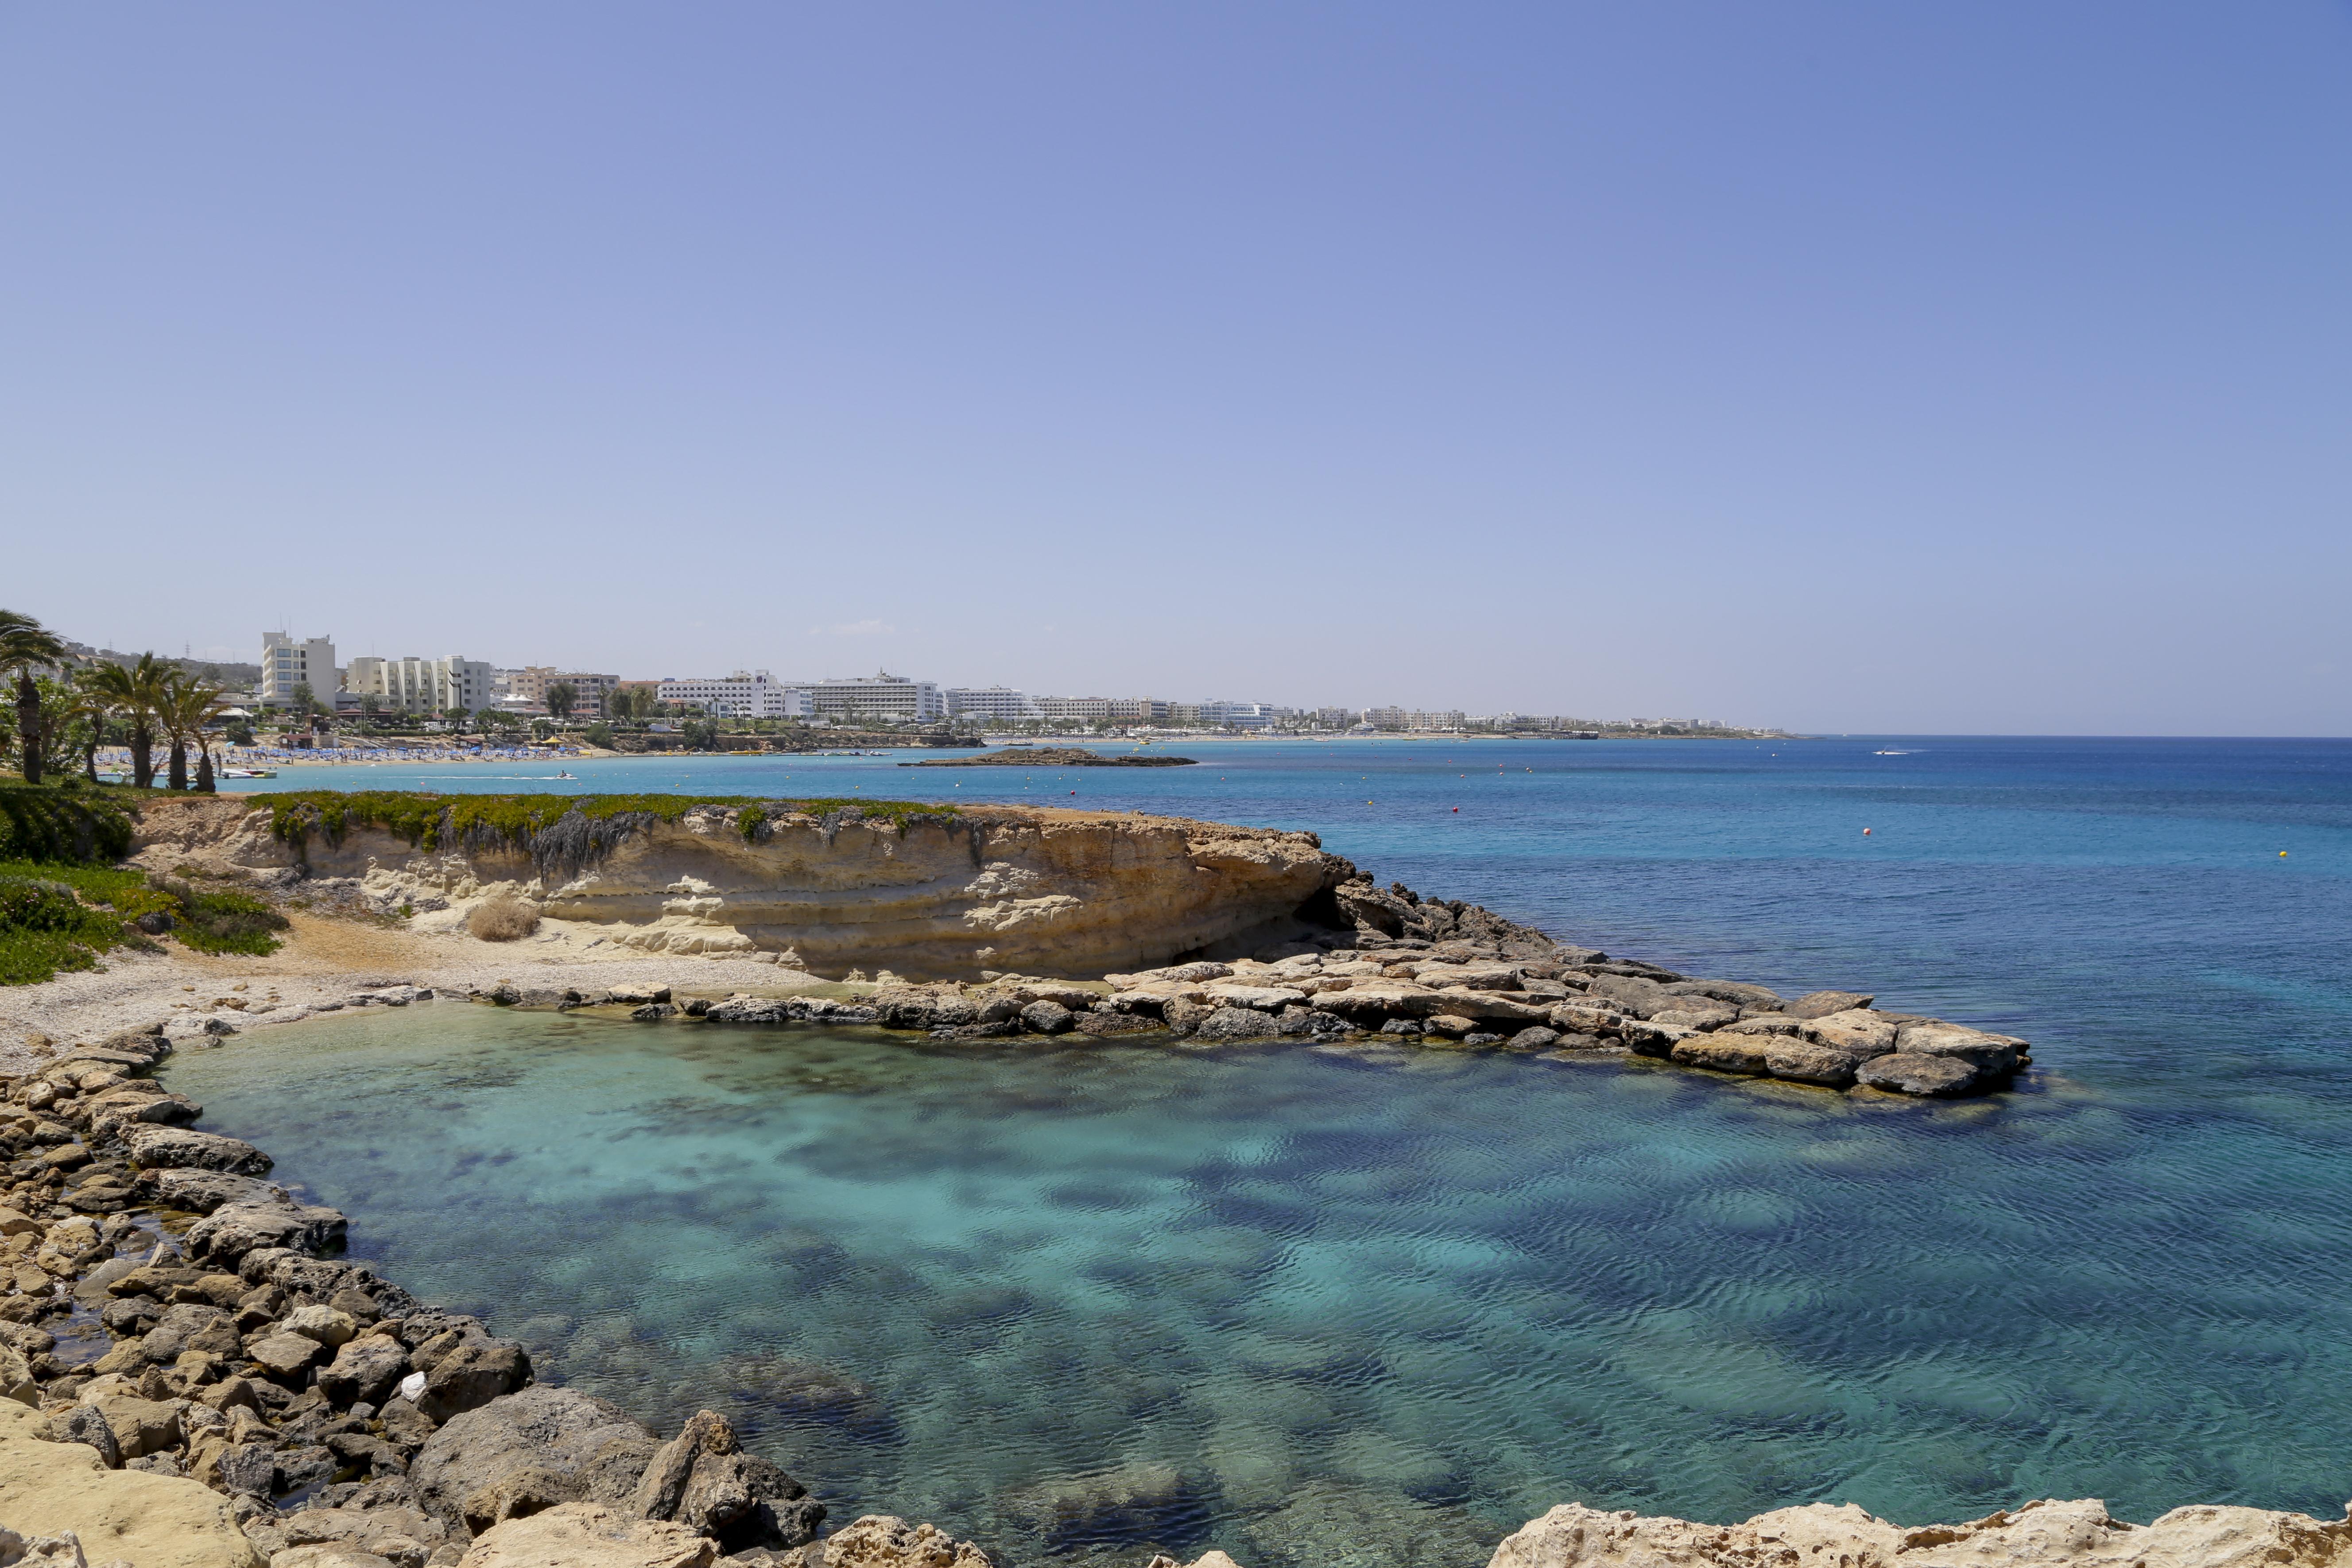 PROTARAS, CYPRUS - APRIL 27: Fig Tree Beach on April 27, 2016 in Protaras, Cyprus.